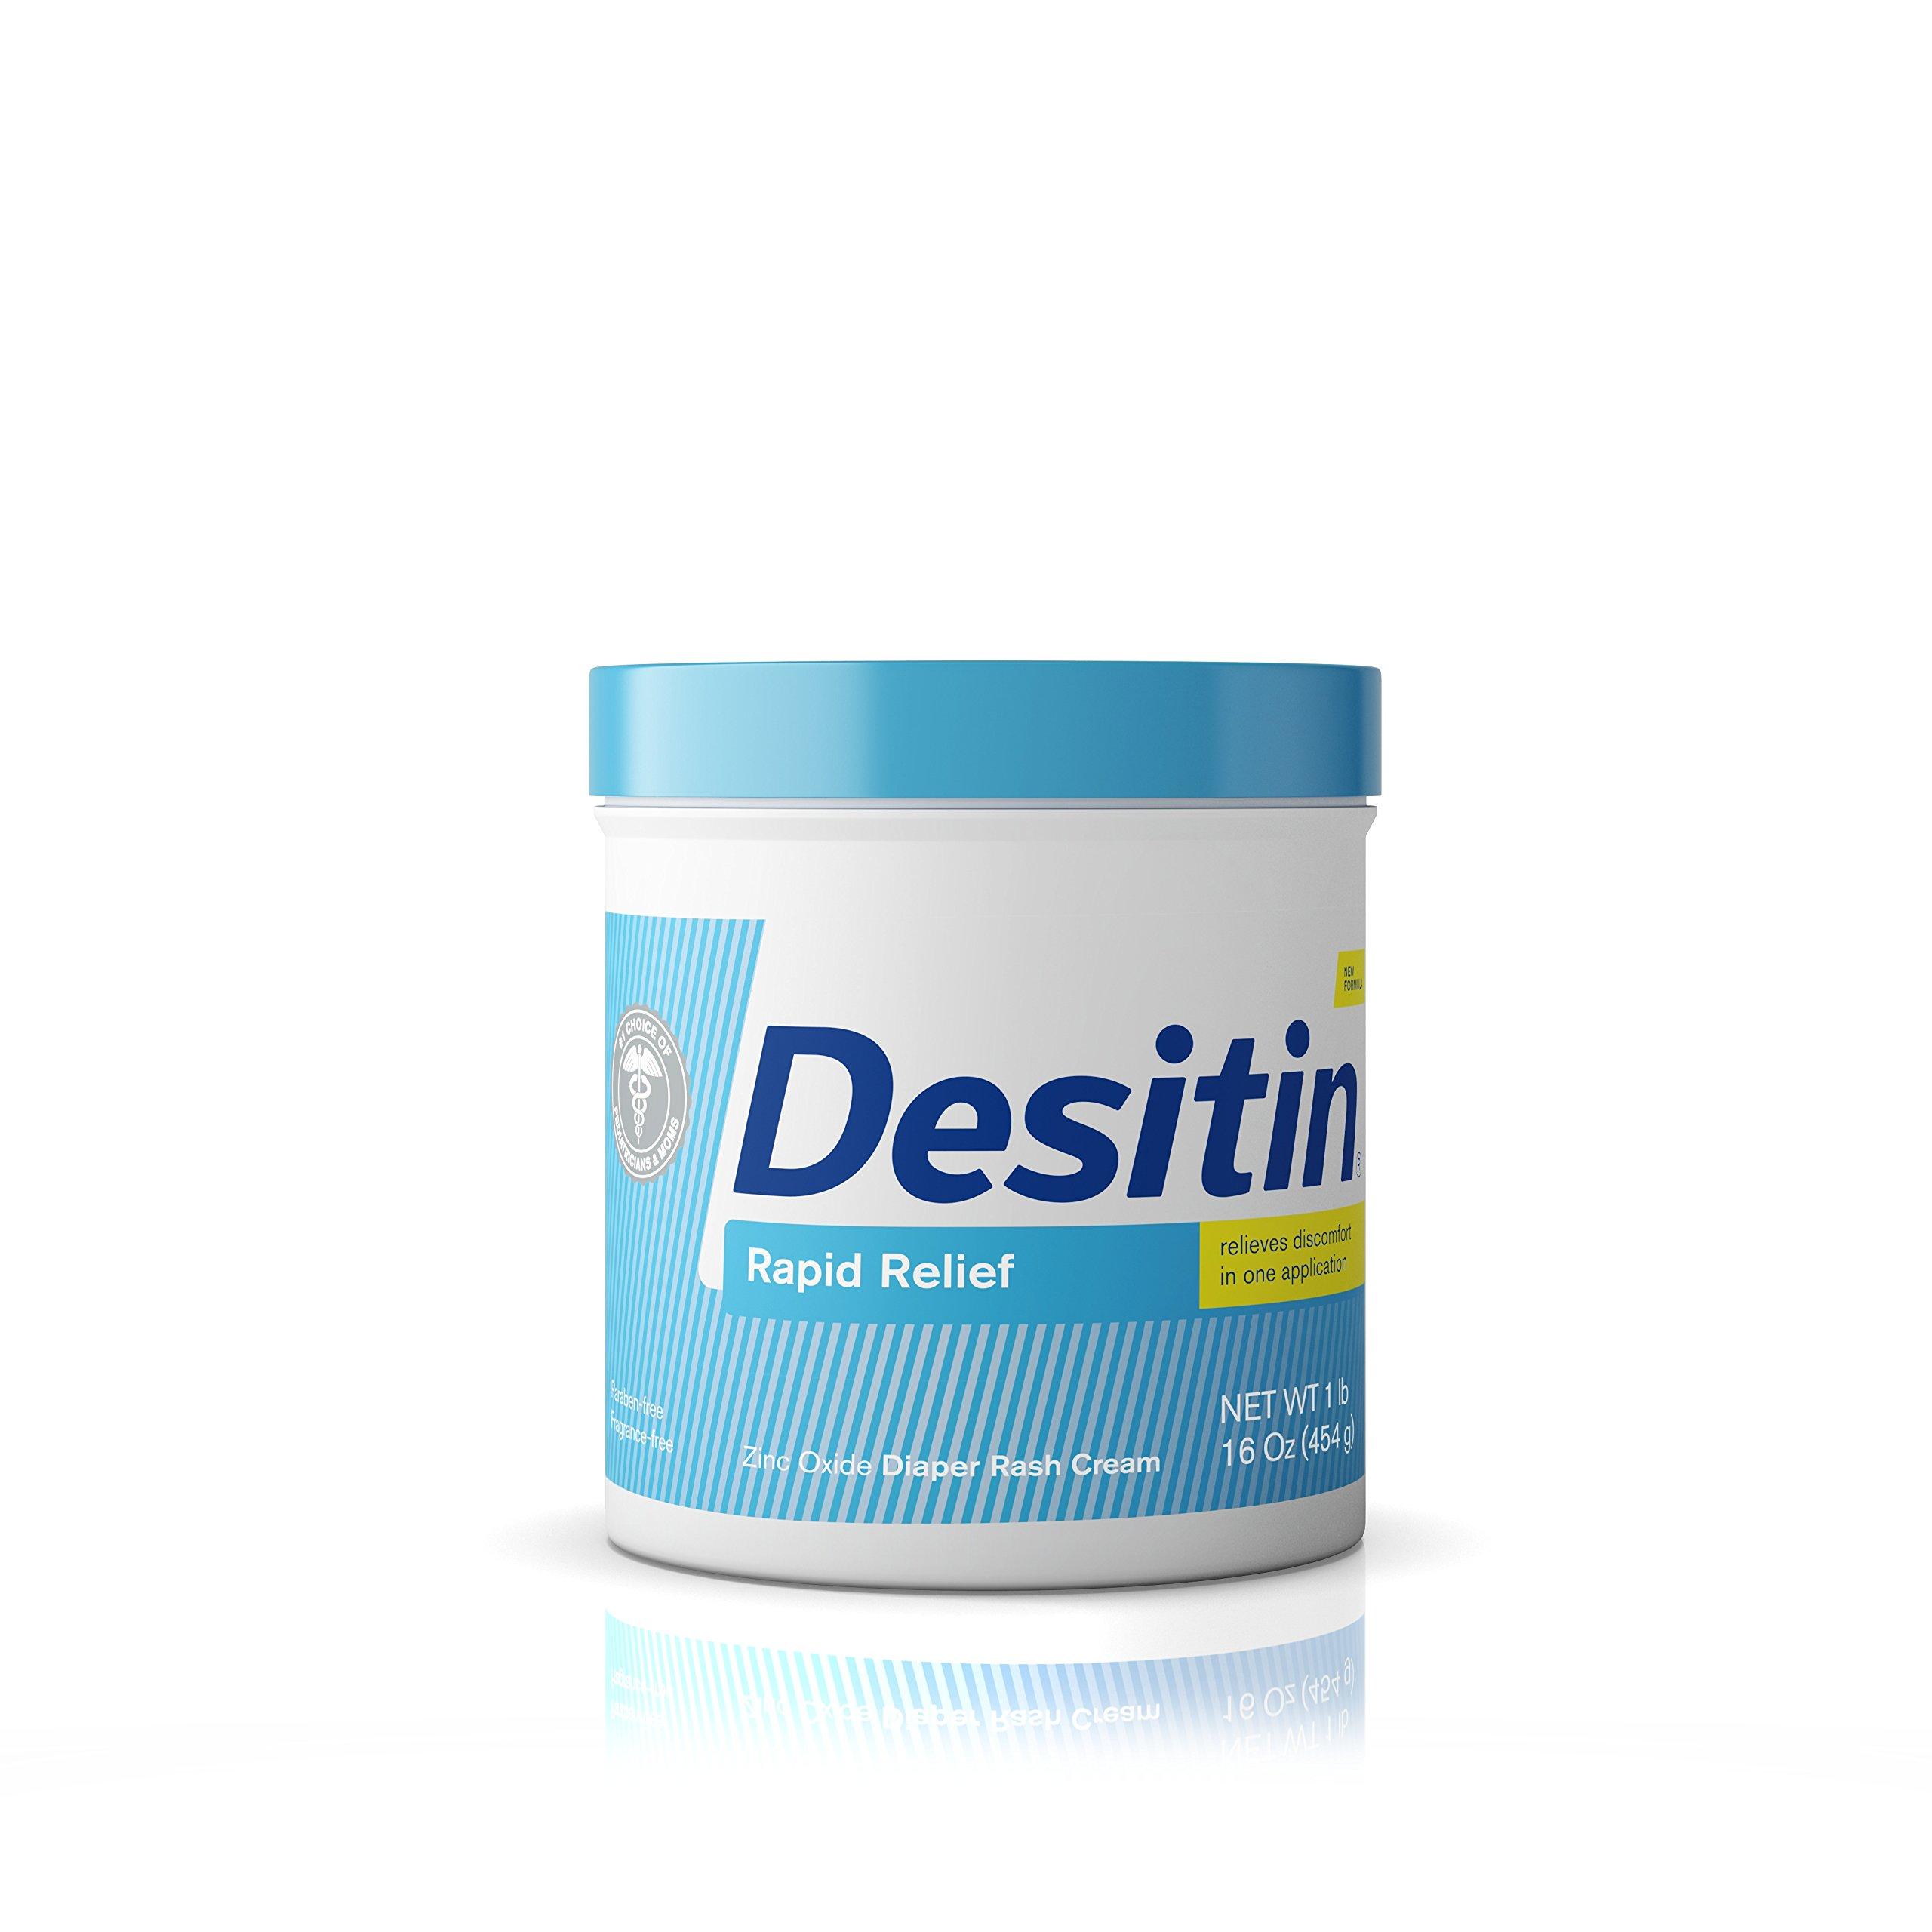 Desitin Rapid Relief Diaper Rash Remedy, Fragrance-Free Cream, 16 Oz